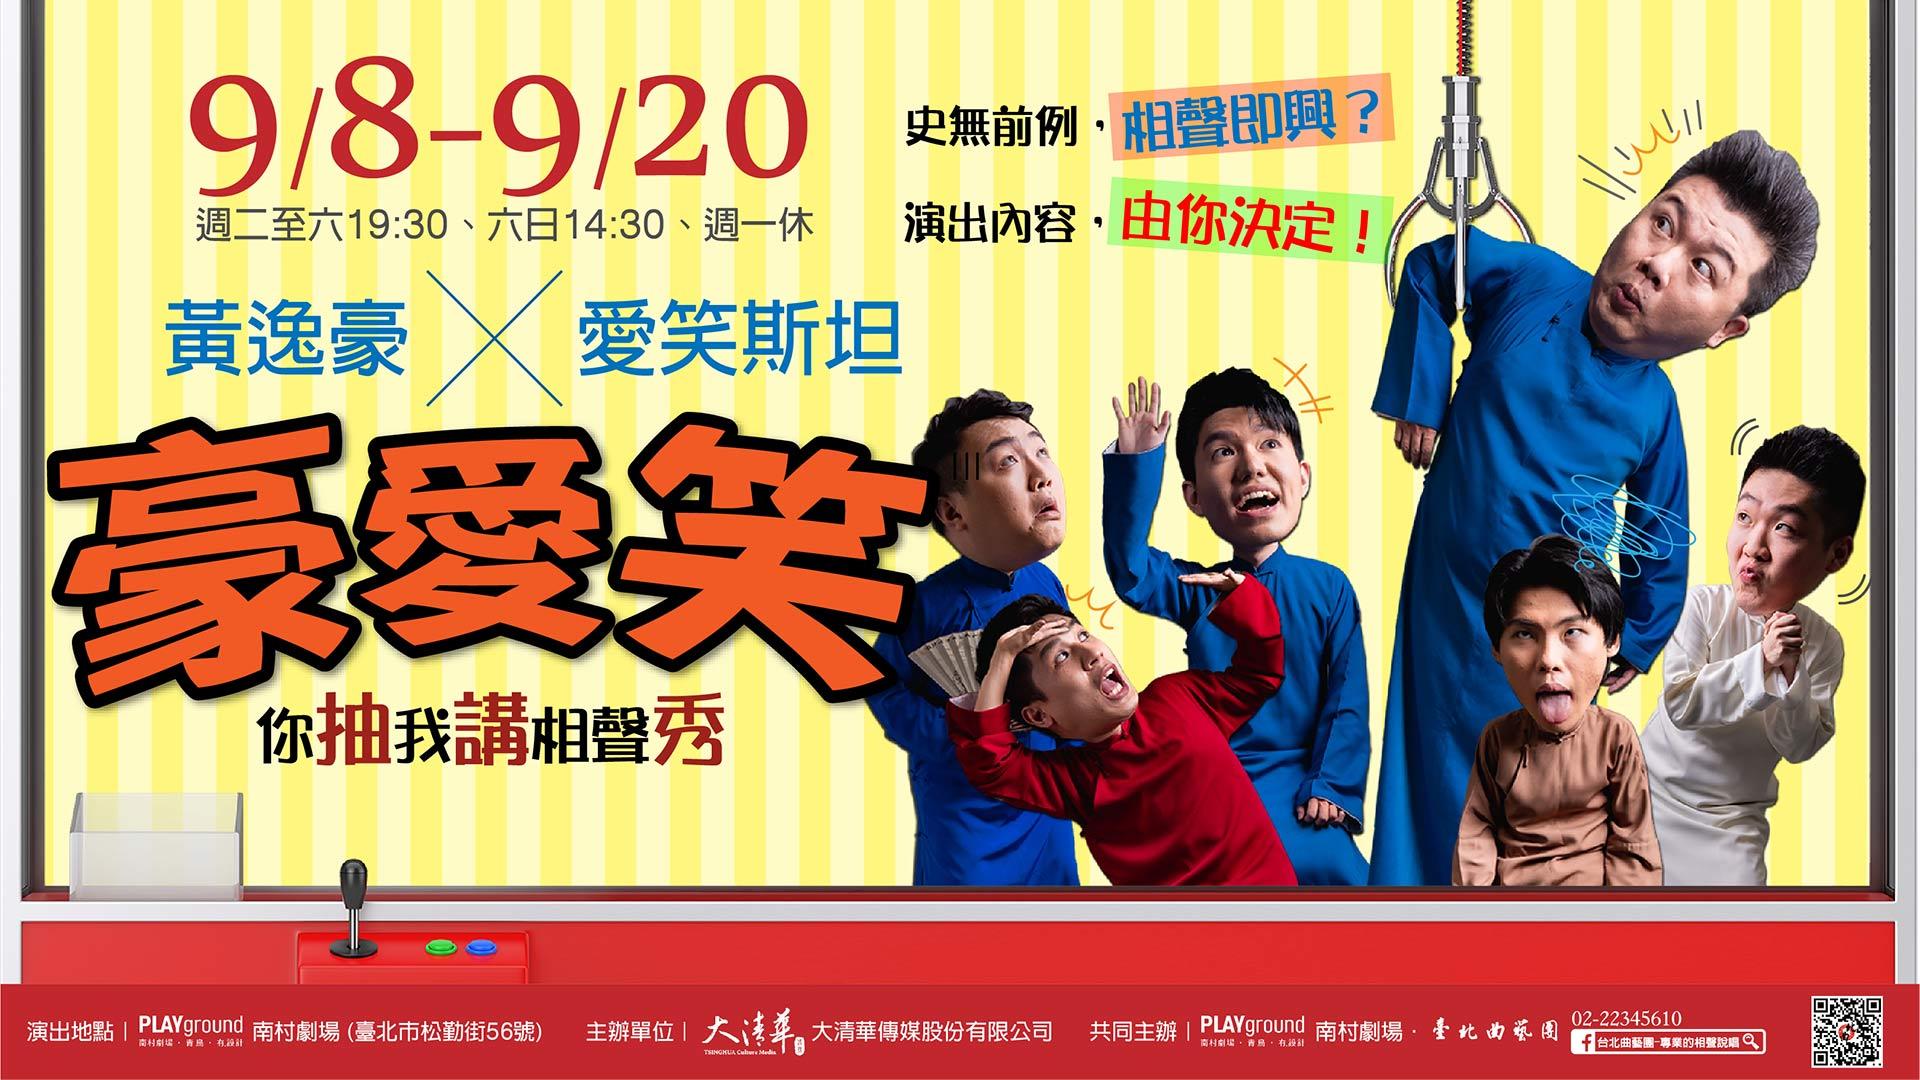 【2020 PLAYground 】台北曲藝團《豪愛笑 你抽我講相聲秀》